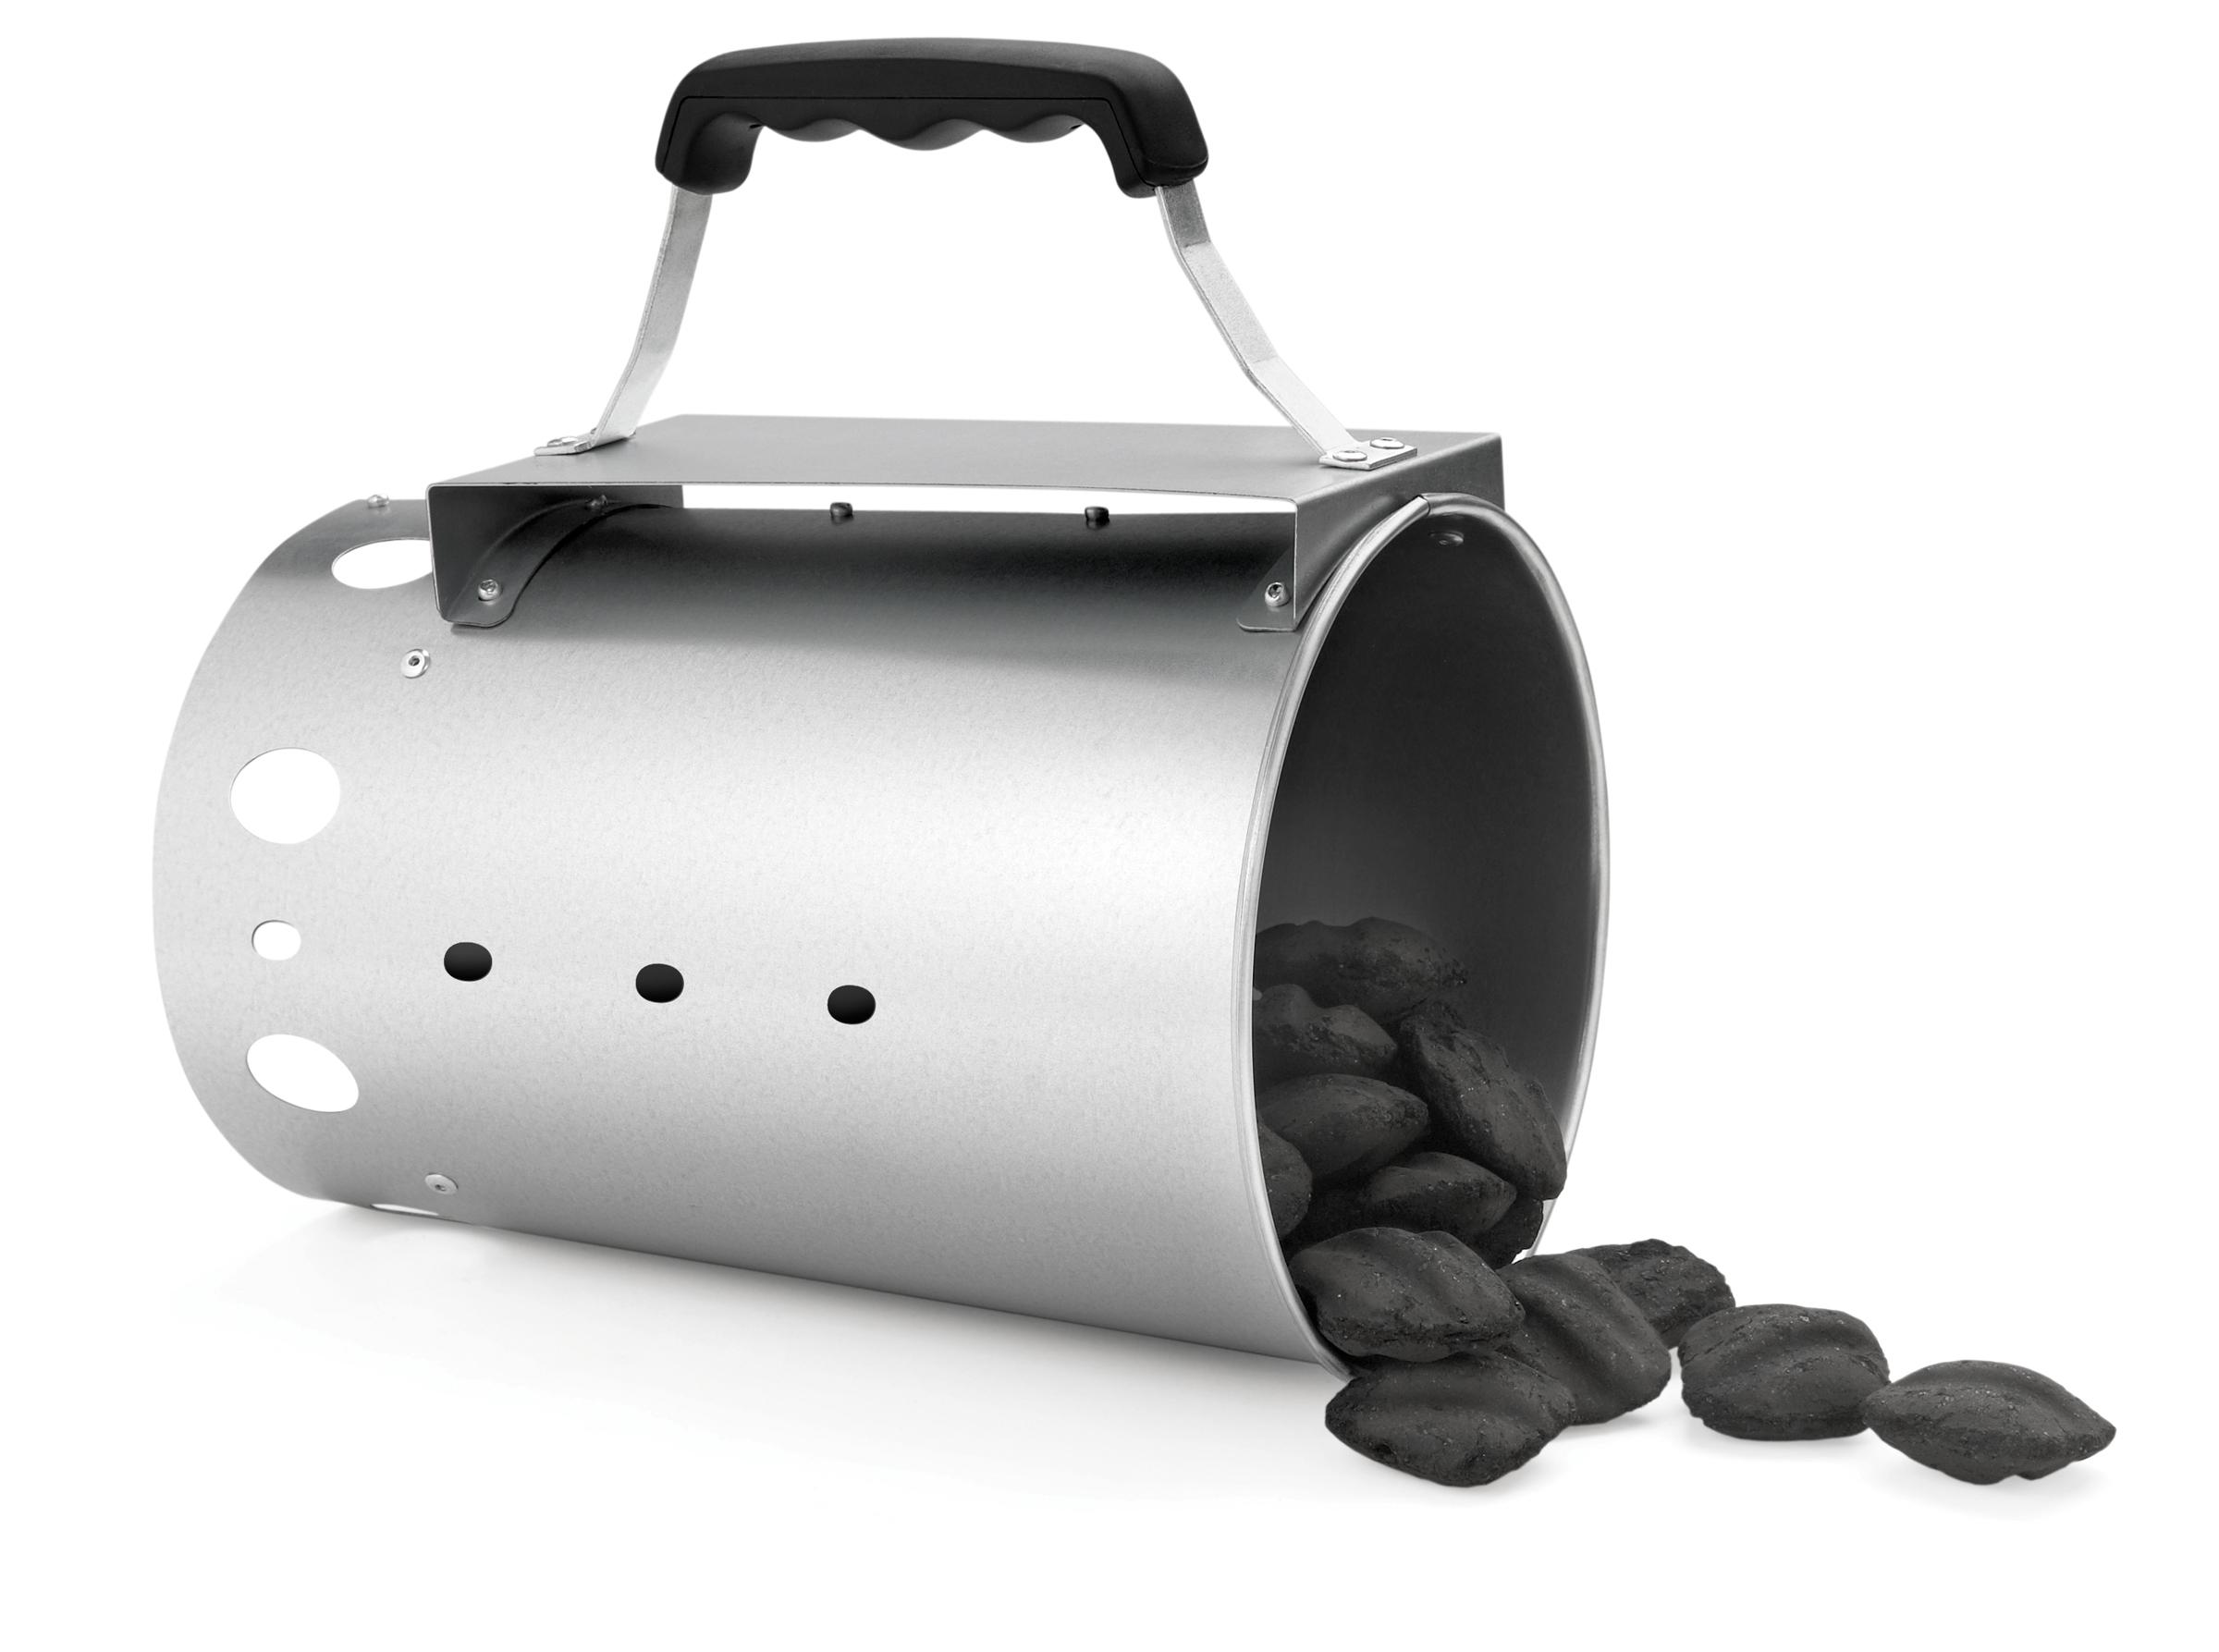 Napoleon Holzkohlegrill Charcoal : Napoleon holzkohlegrill charcoal pro edelstahl